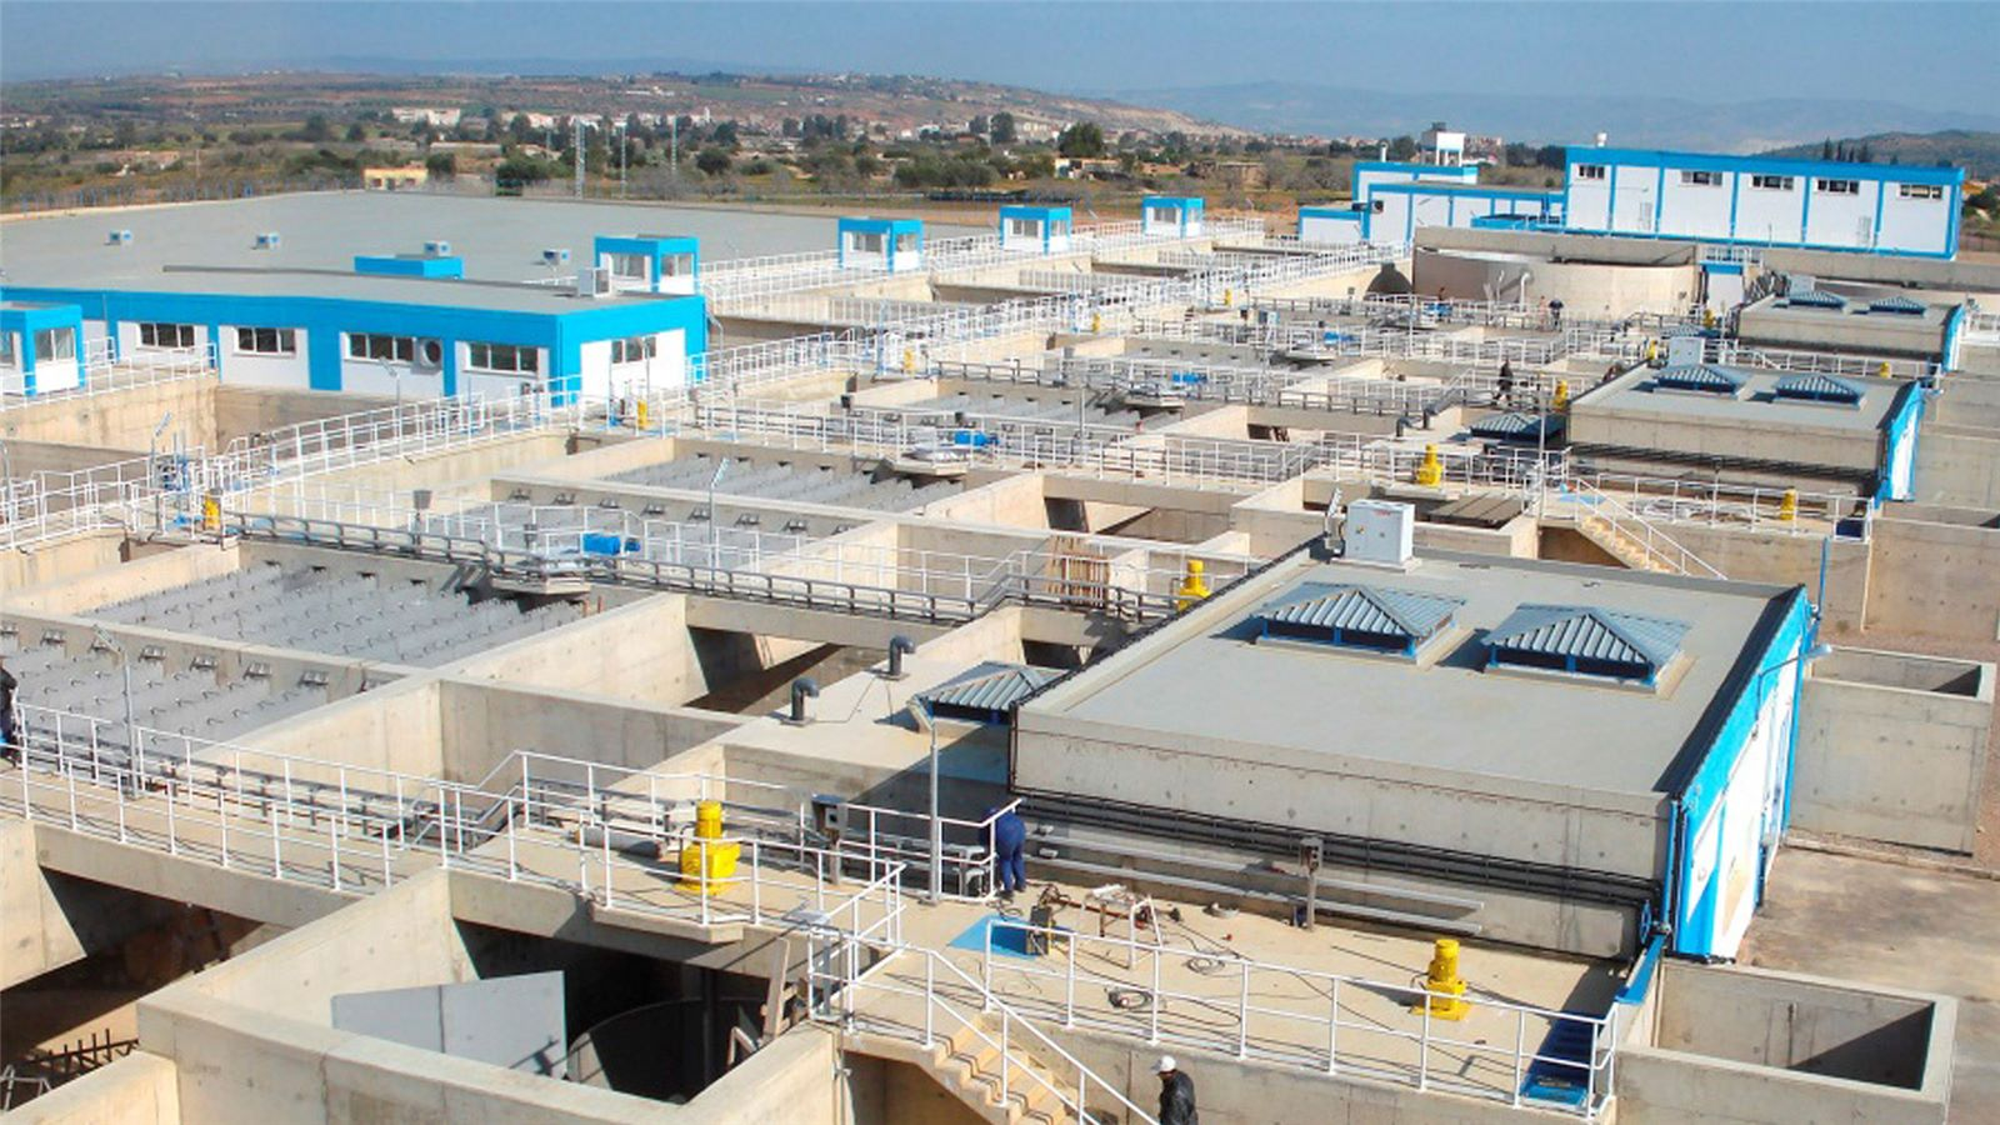 Usine d'eau potable de Sidi Lahdjel